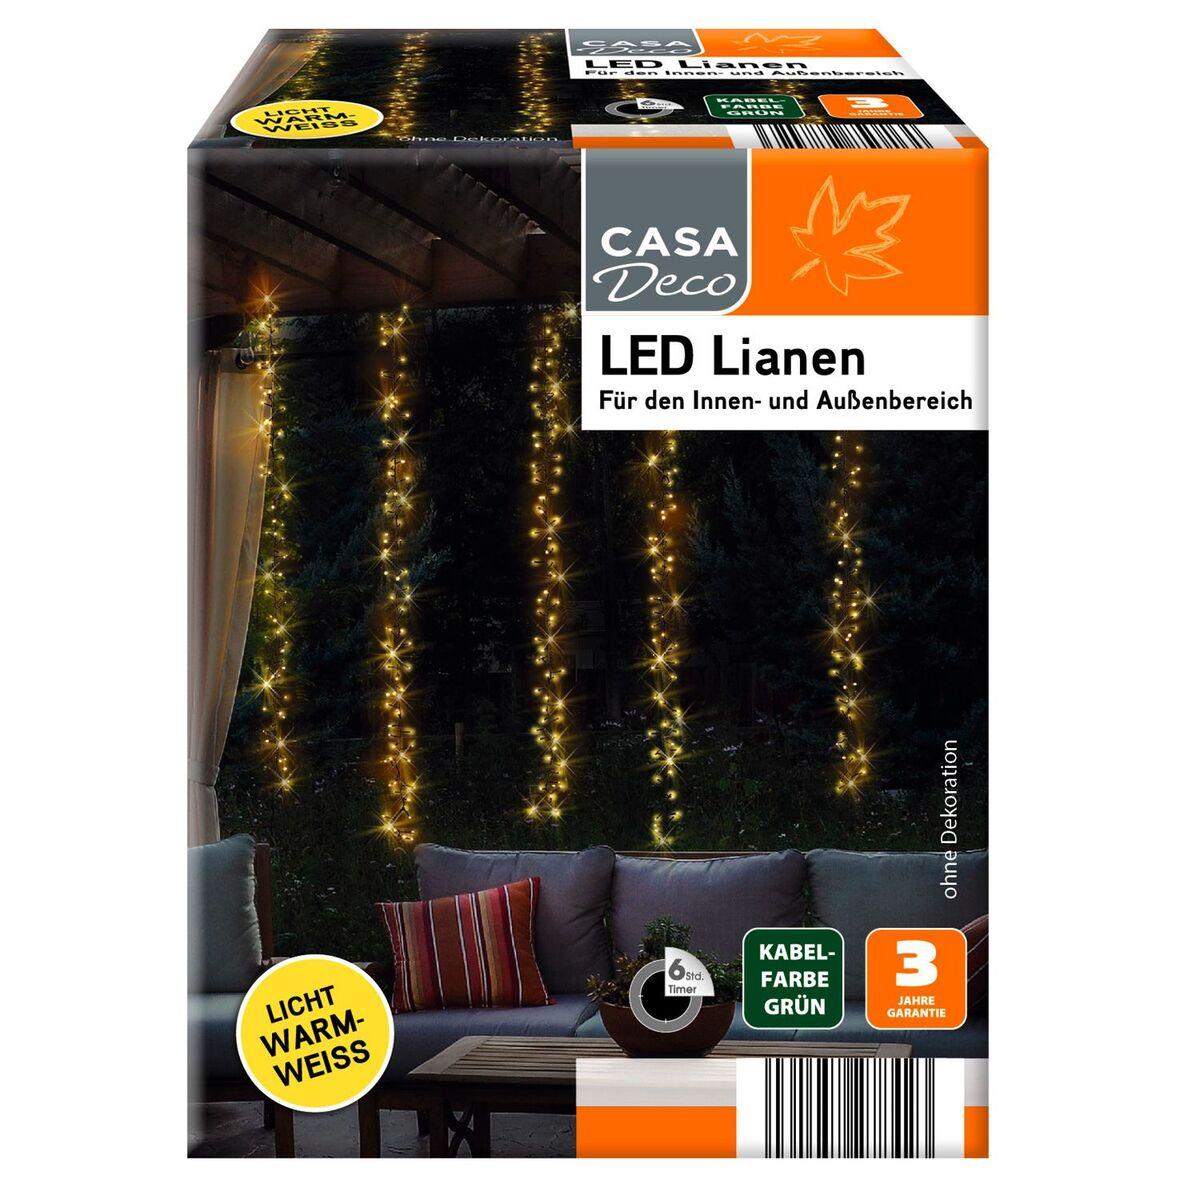 Bild 1 von CASA DECO LED-Lianen